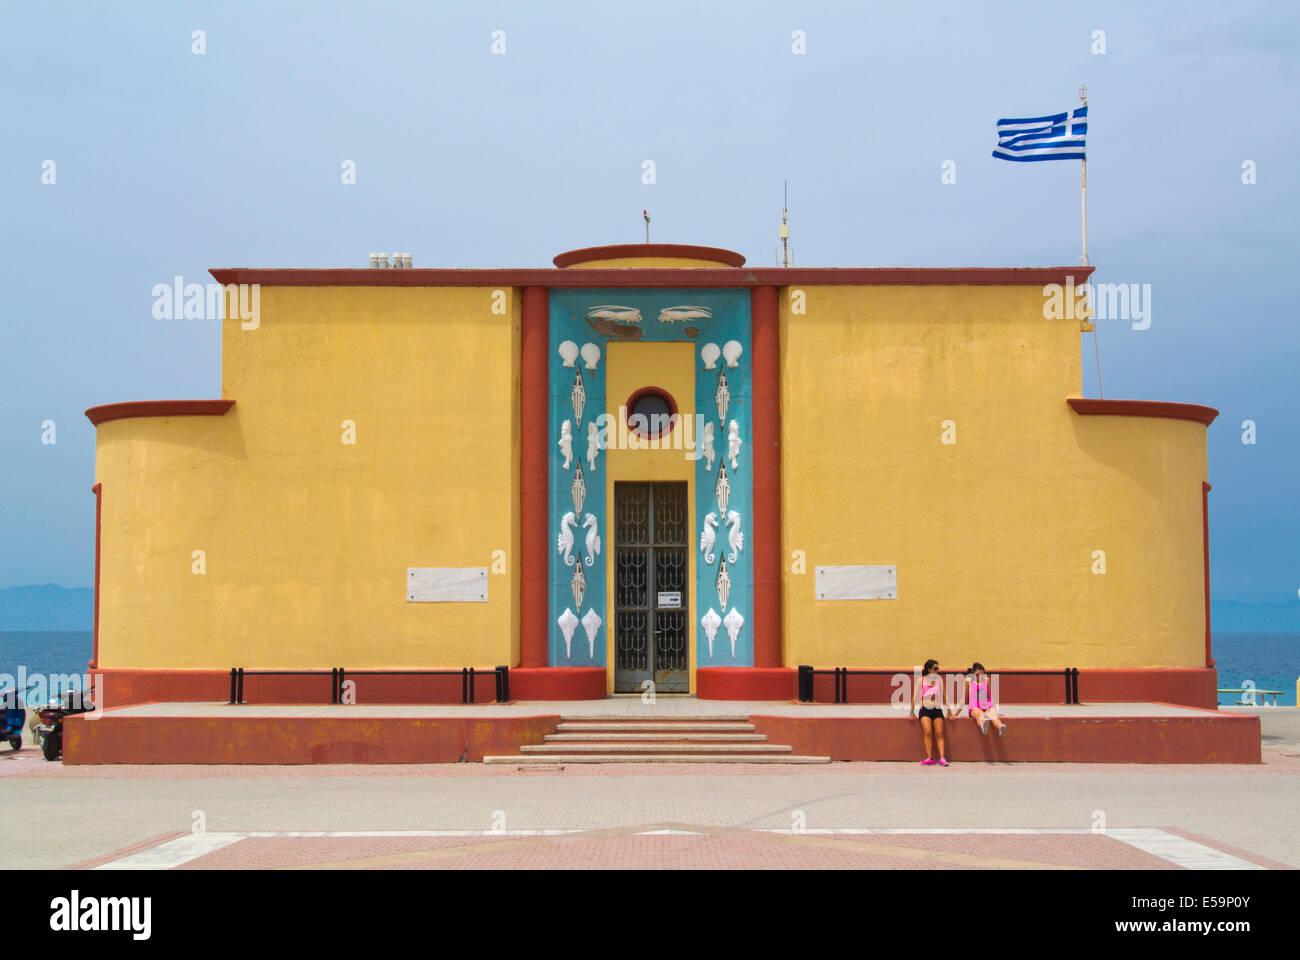 Aquarium and museum marine life, Rhodes town, Rhodes island, Dodecanese islands, South Aegean region, Greece, Europe - Stock Image